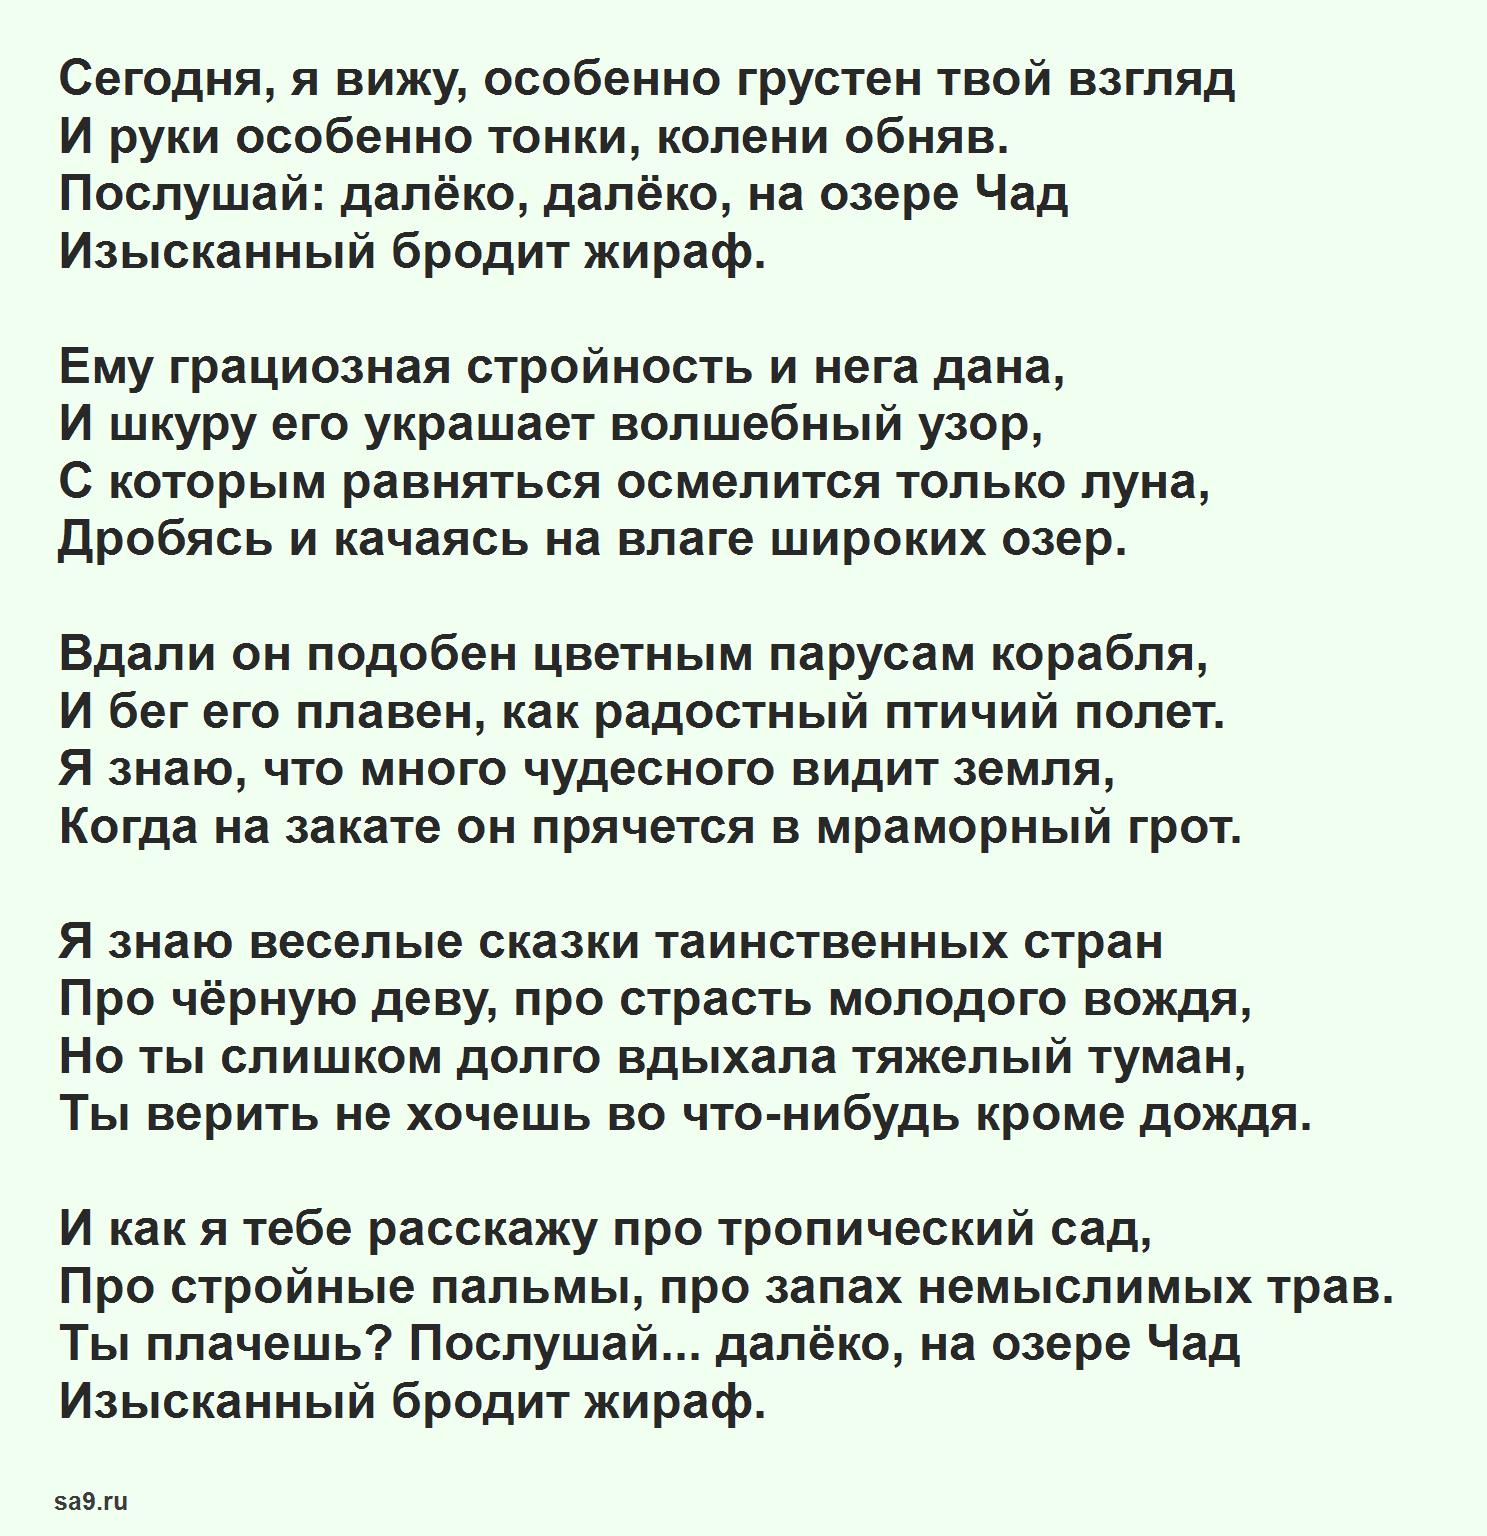 Жираф - Гумилев стихи